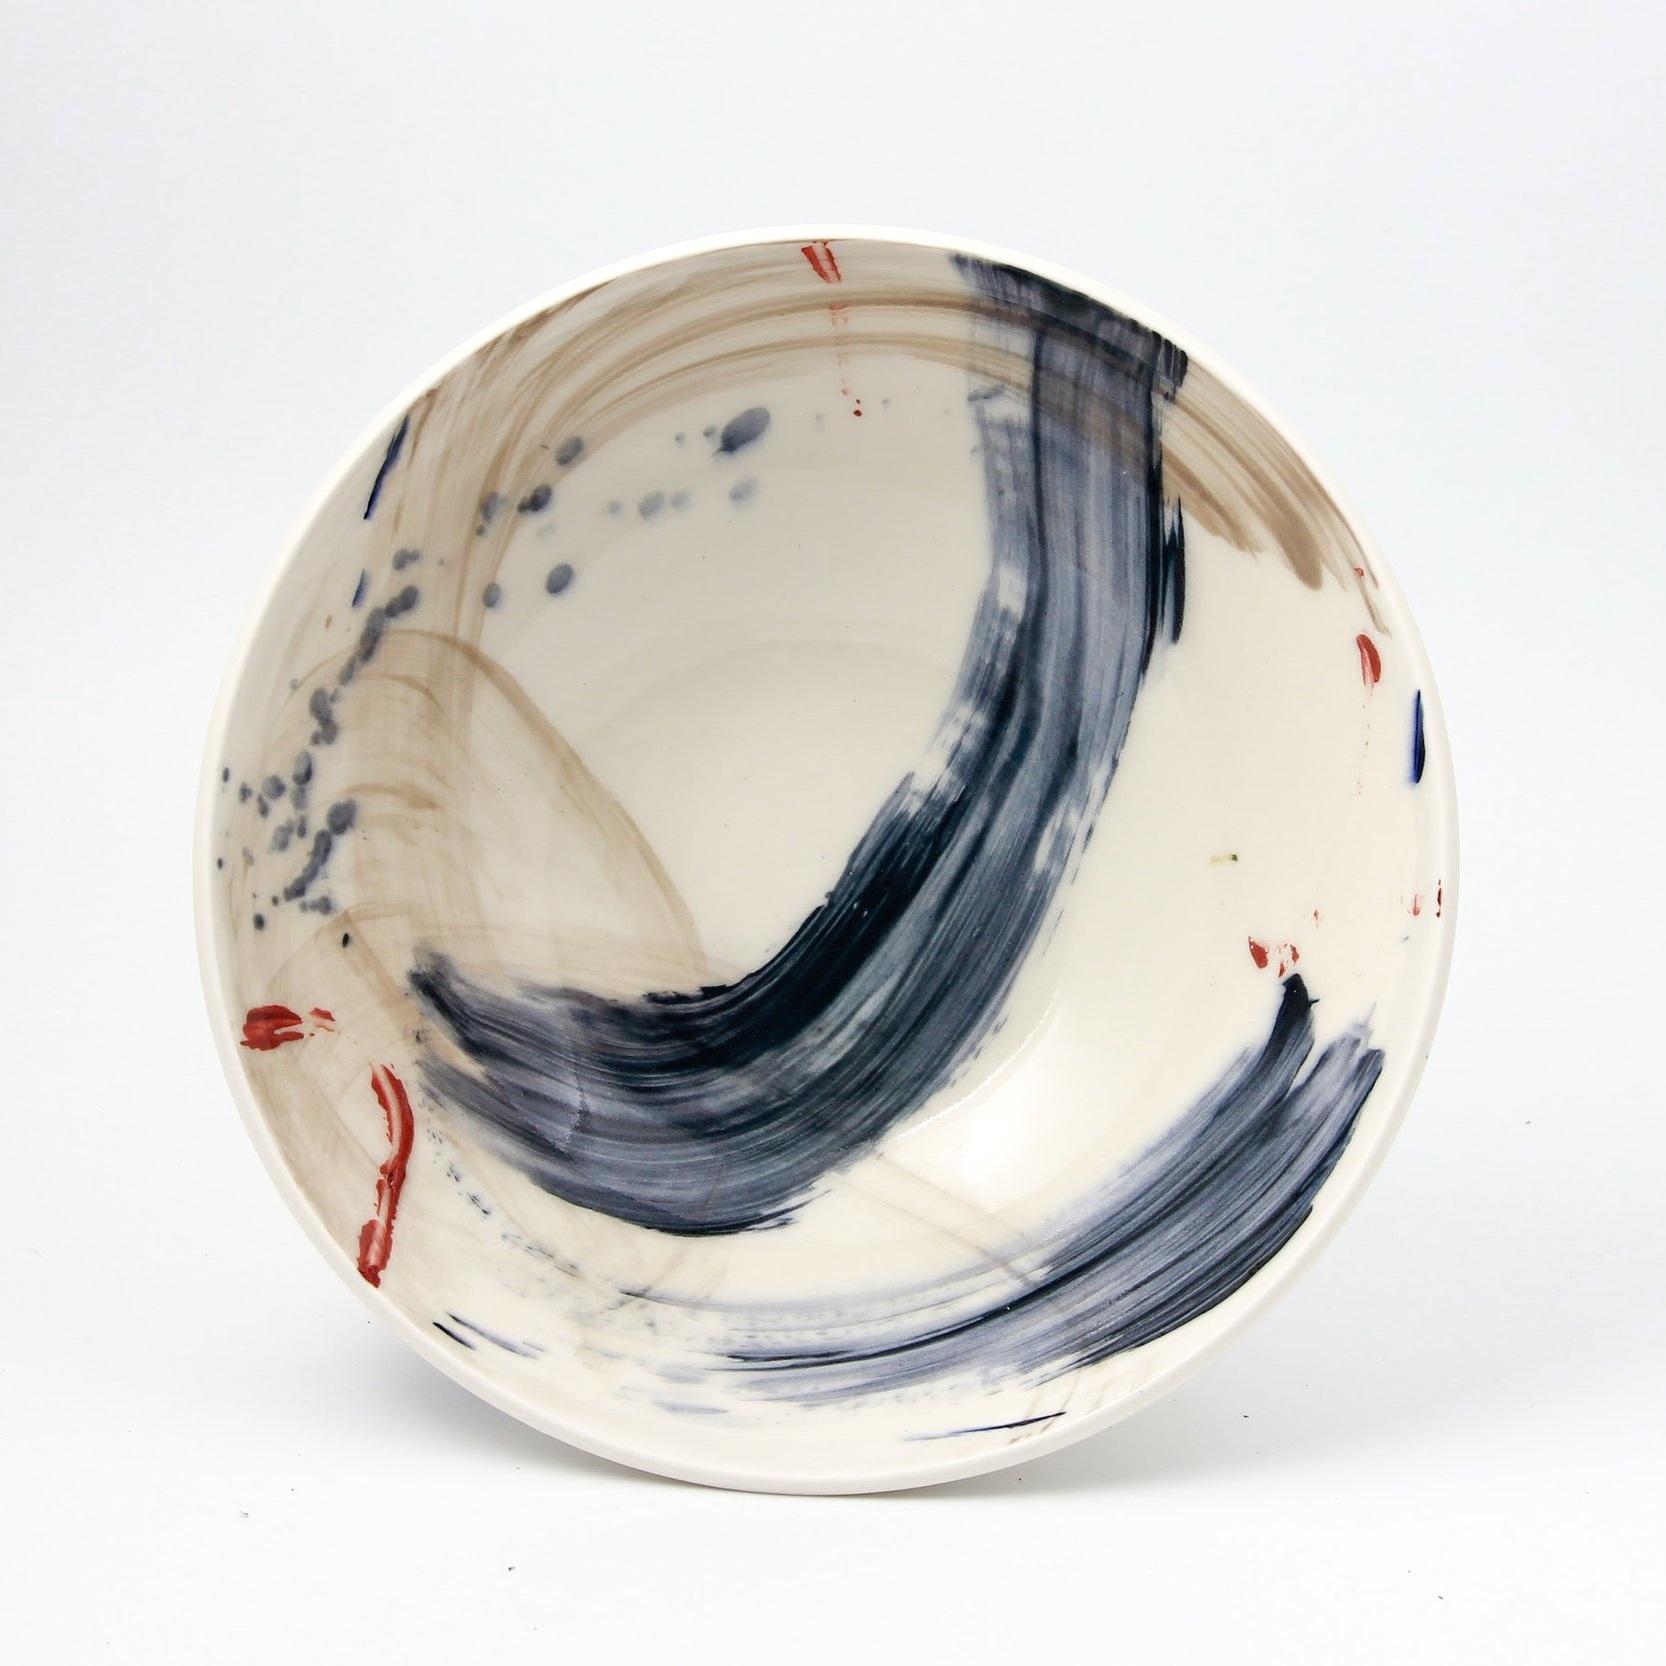 Chris_Crawford_Slip_Decorated_Plate.jpg